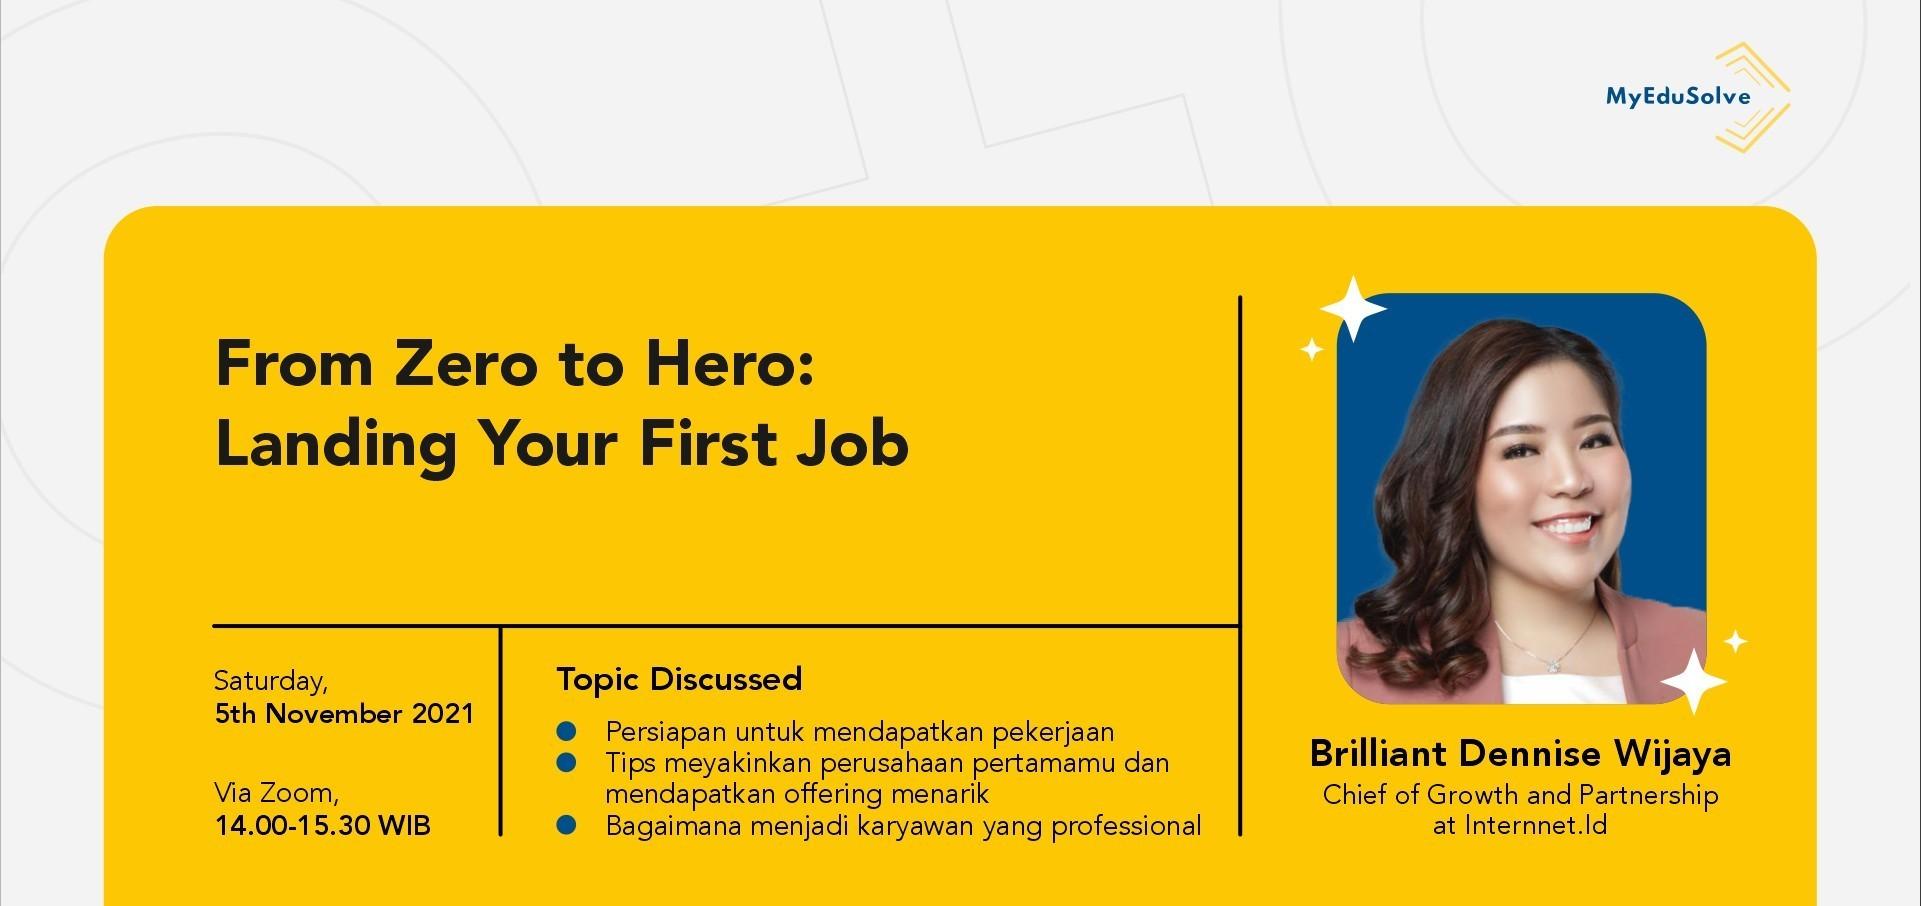 From Zero to Hero : Landing Your First Job